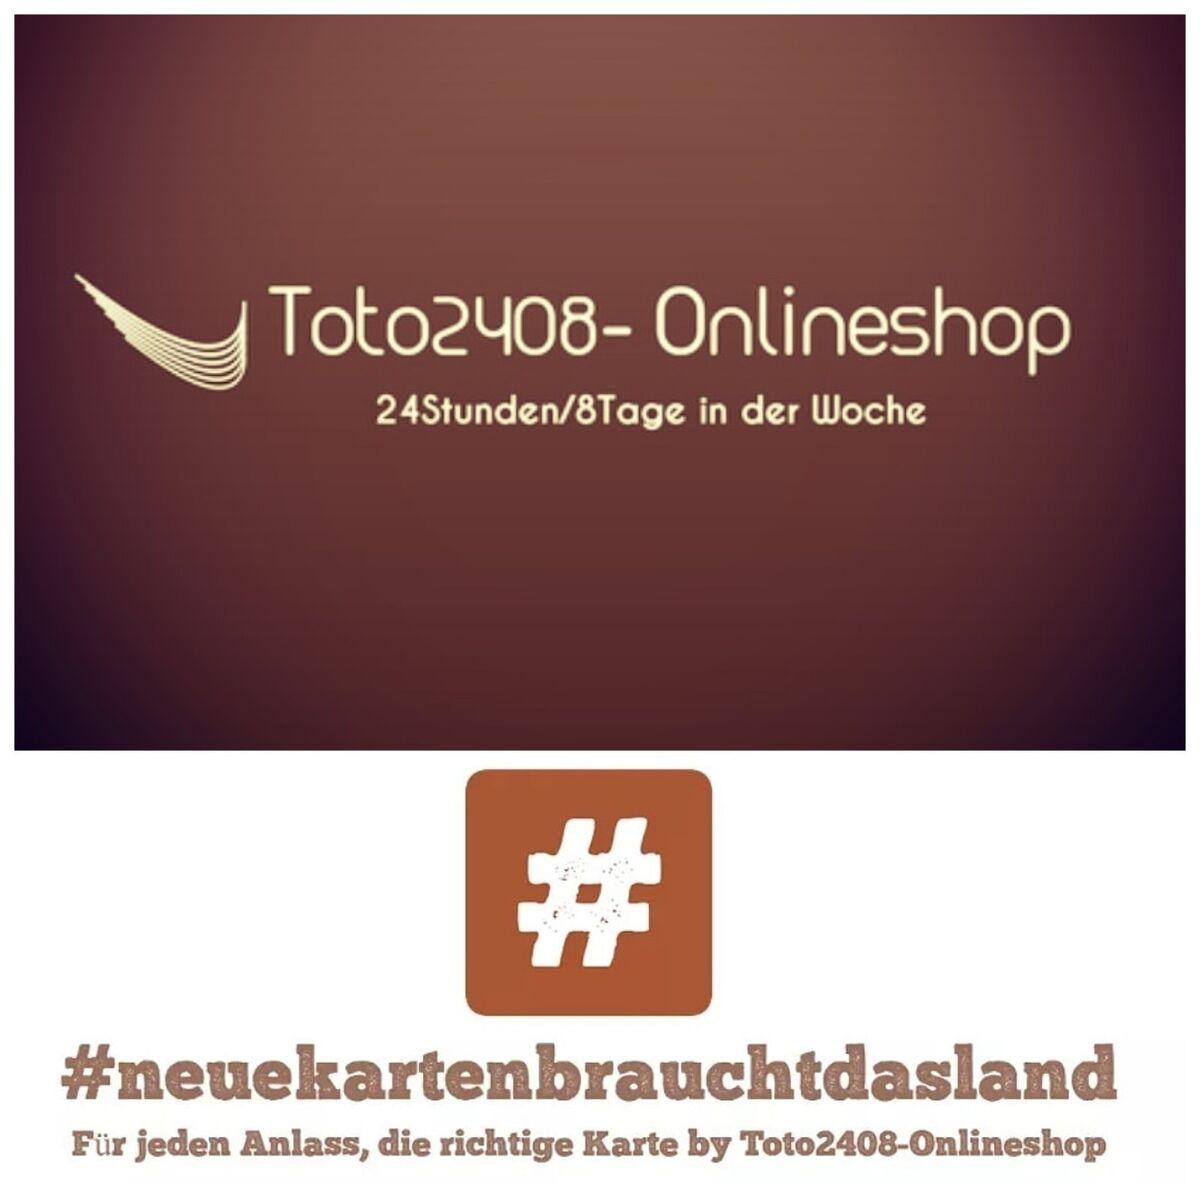 toto2408-Onlineshop